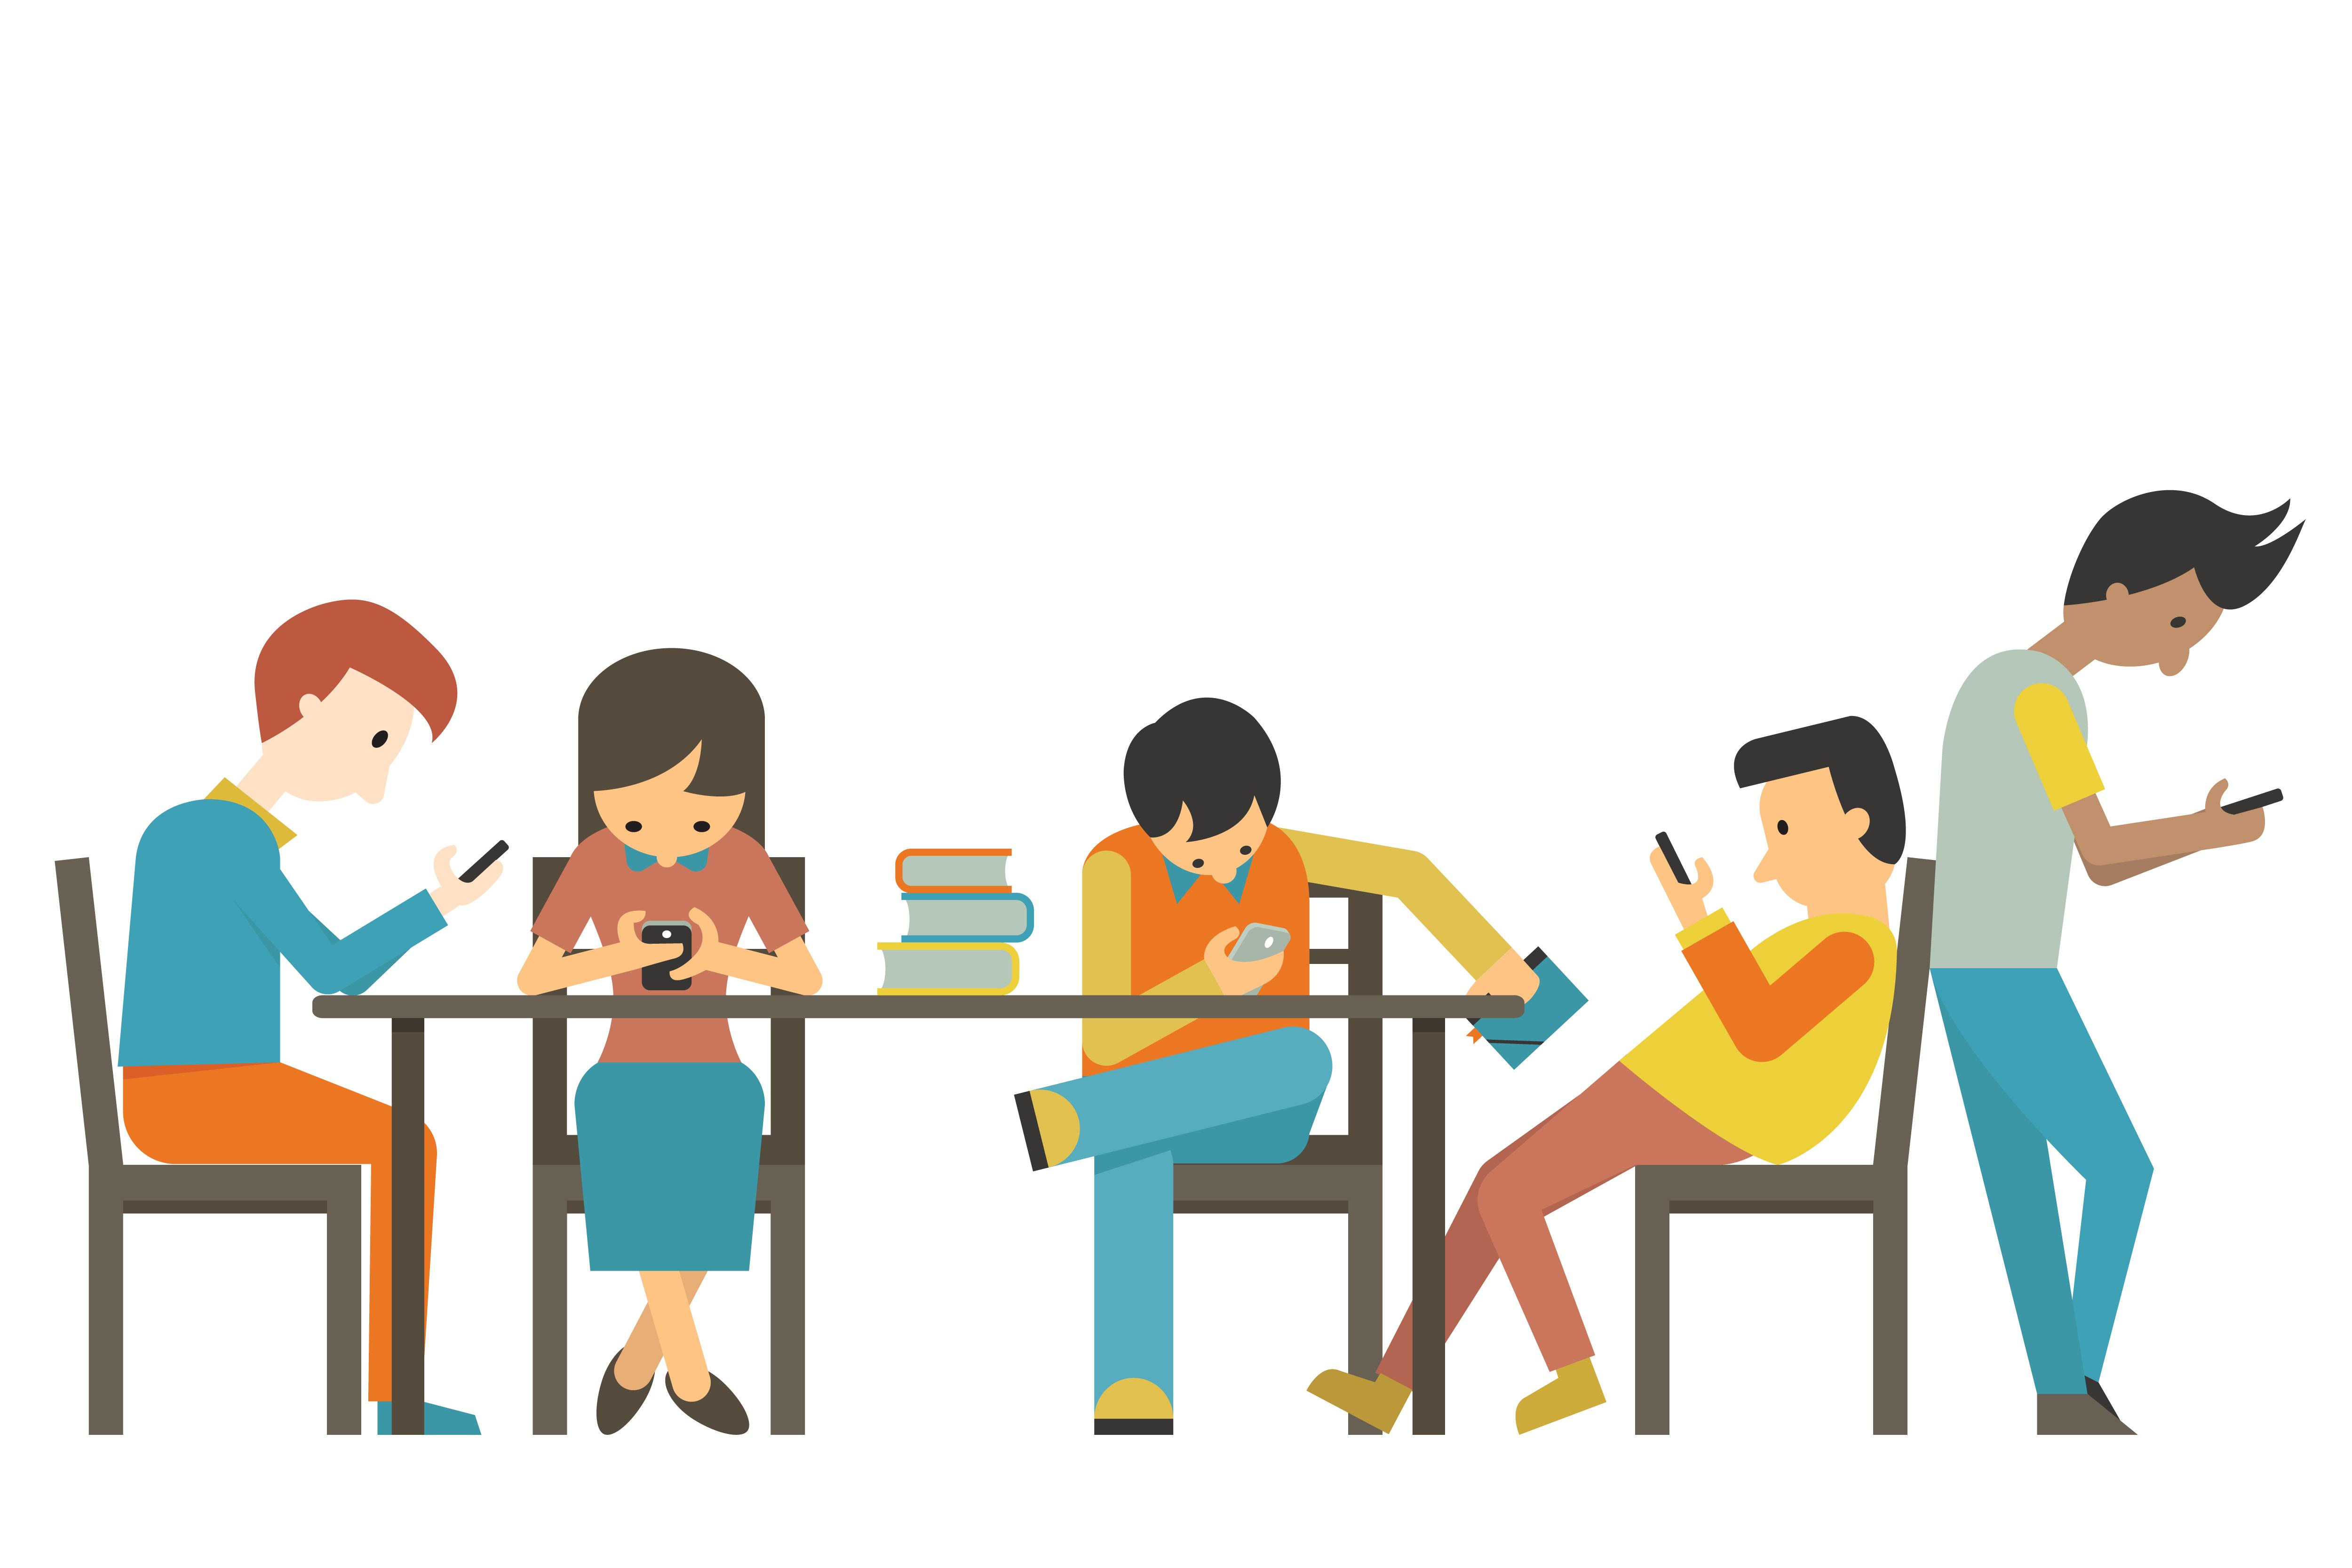 5000x3333 Cell Phone Addiction Dials Up Concerns Health Beat Spectrum Health